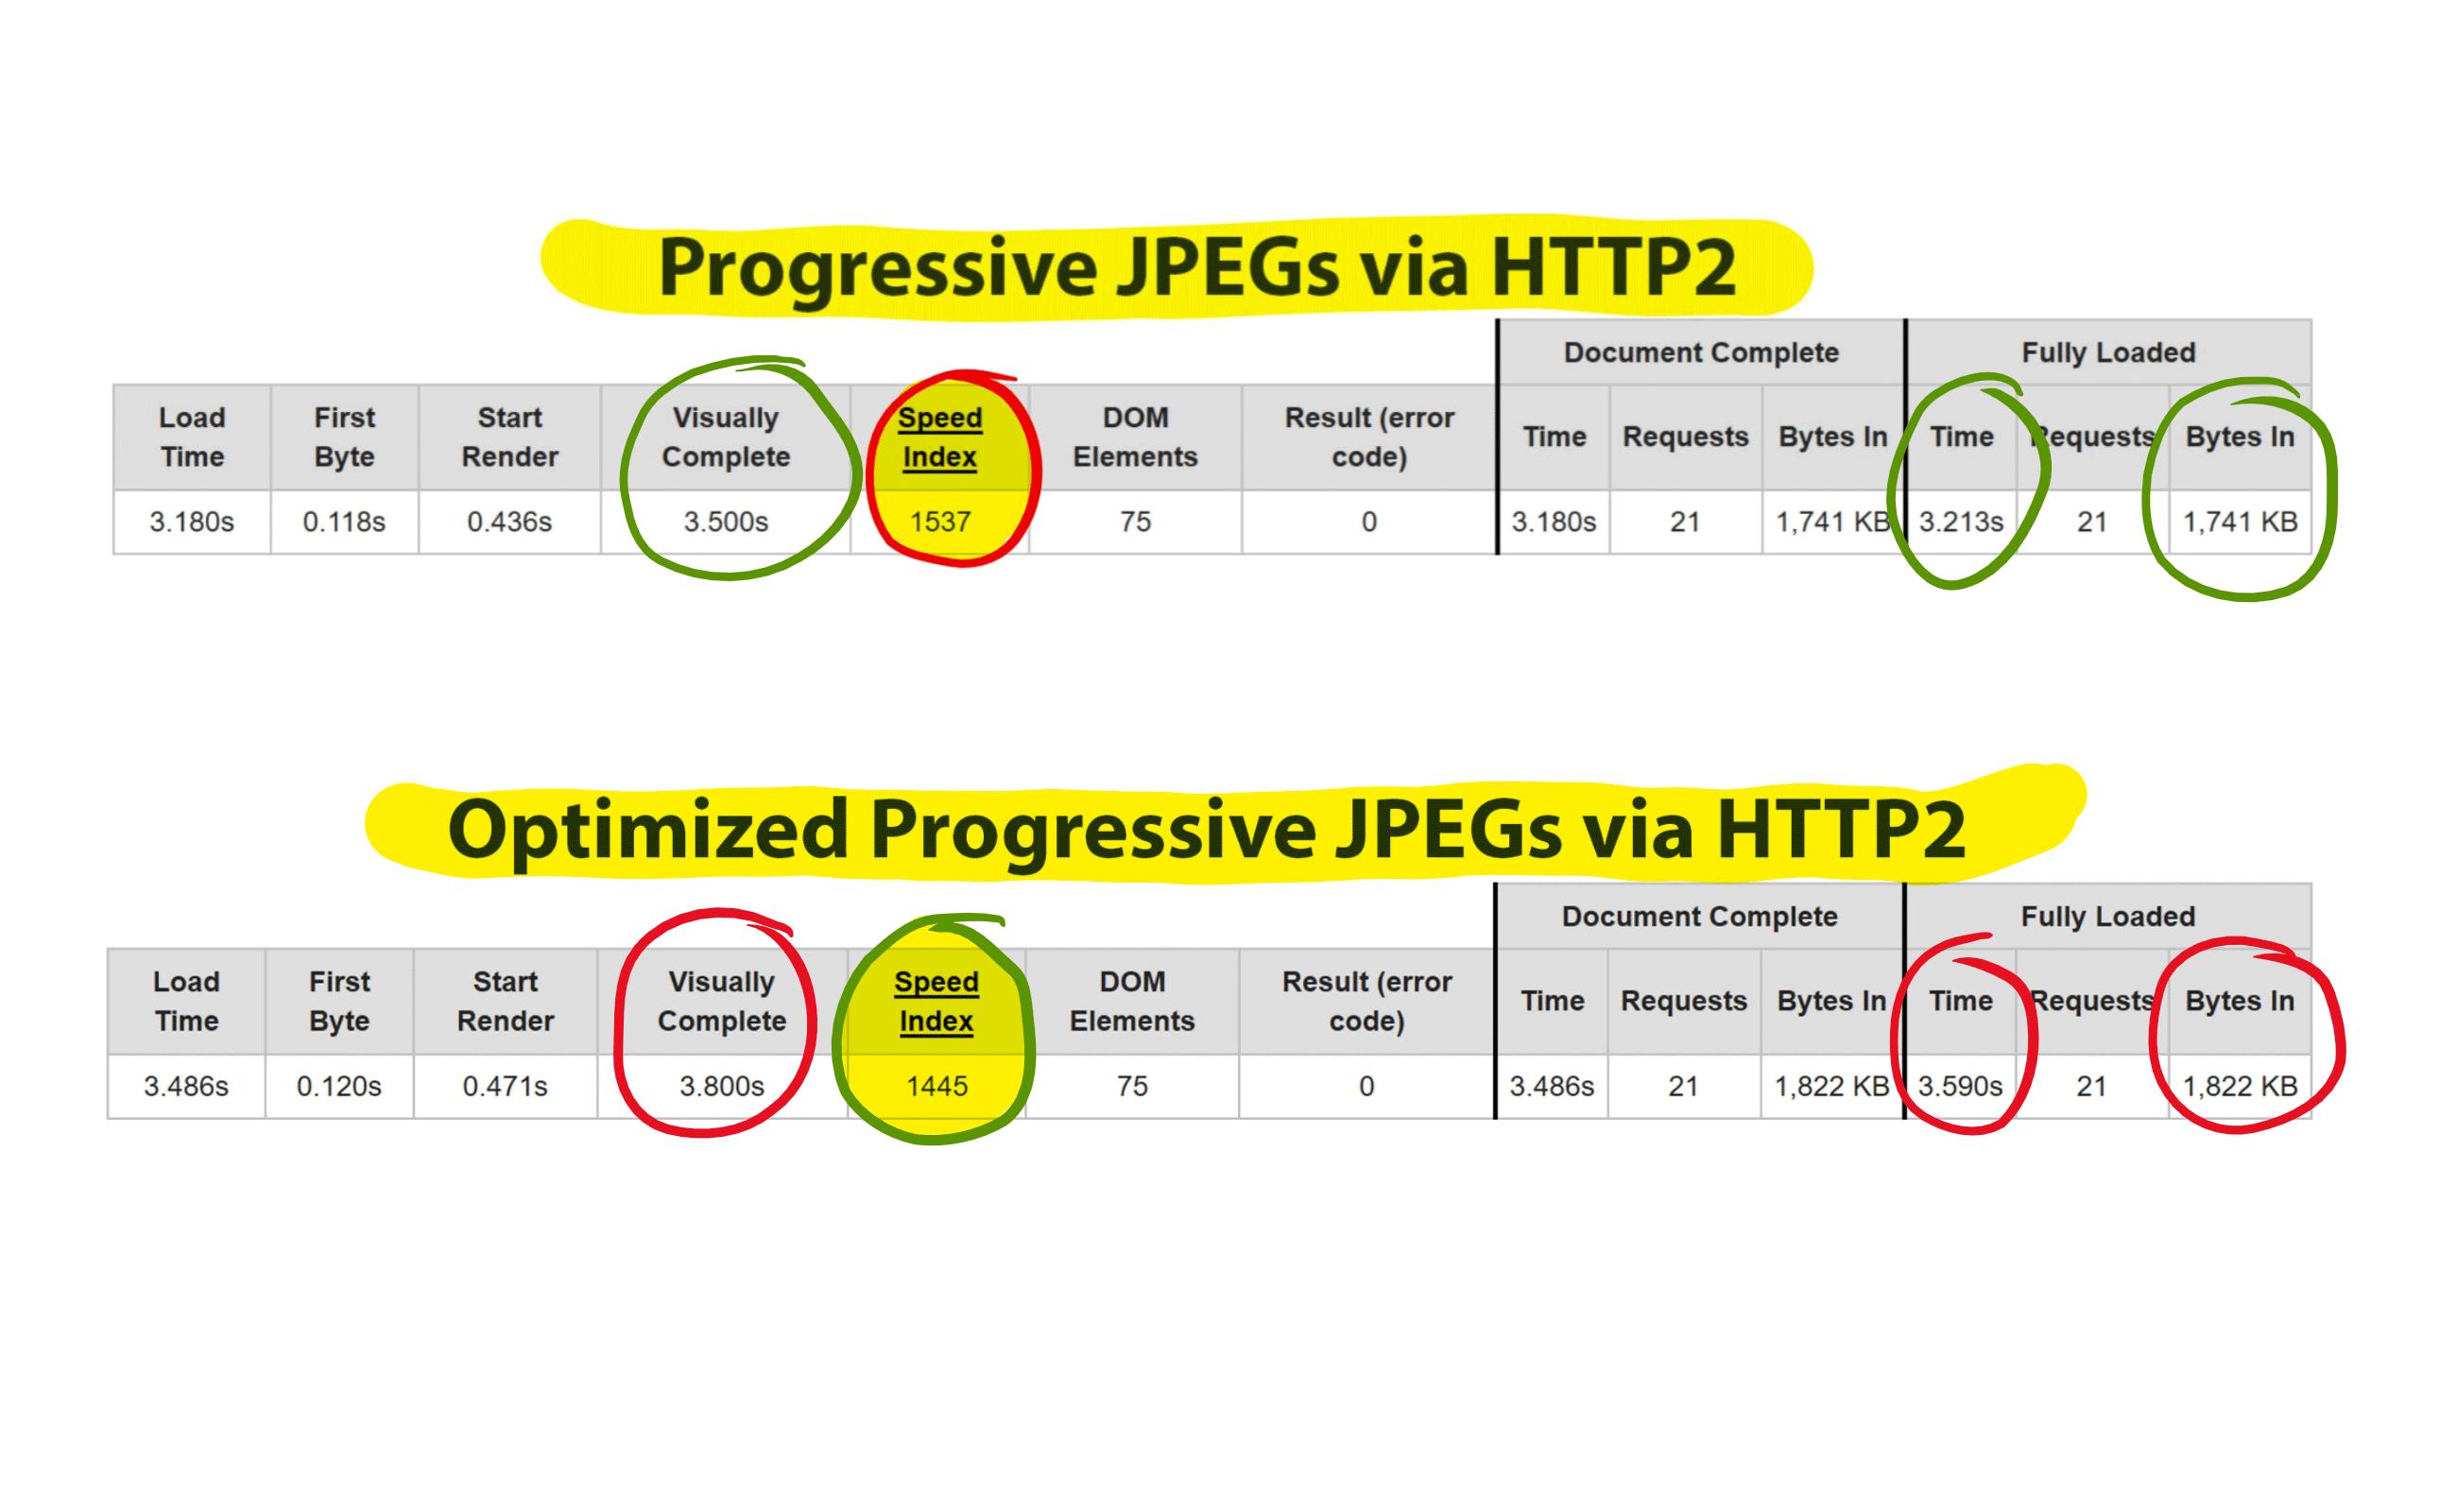 WebPagetest results